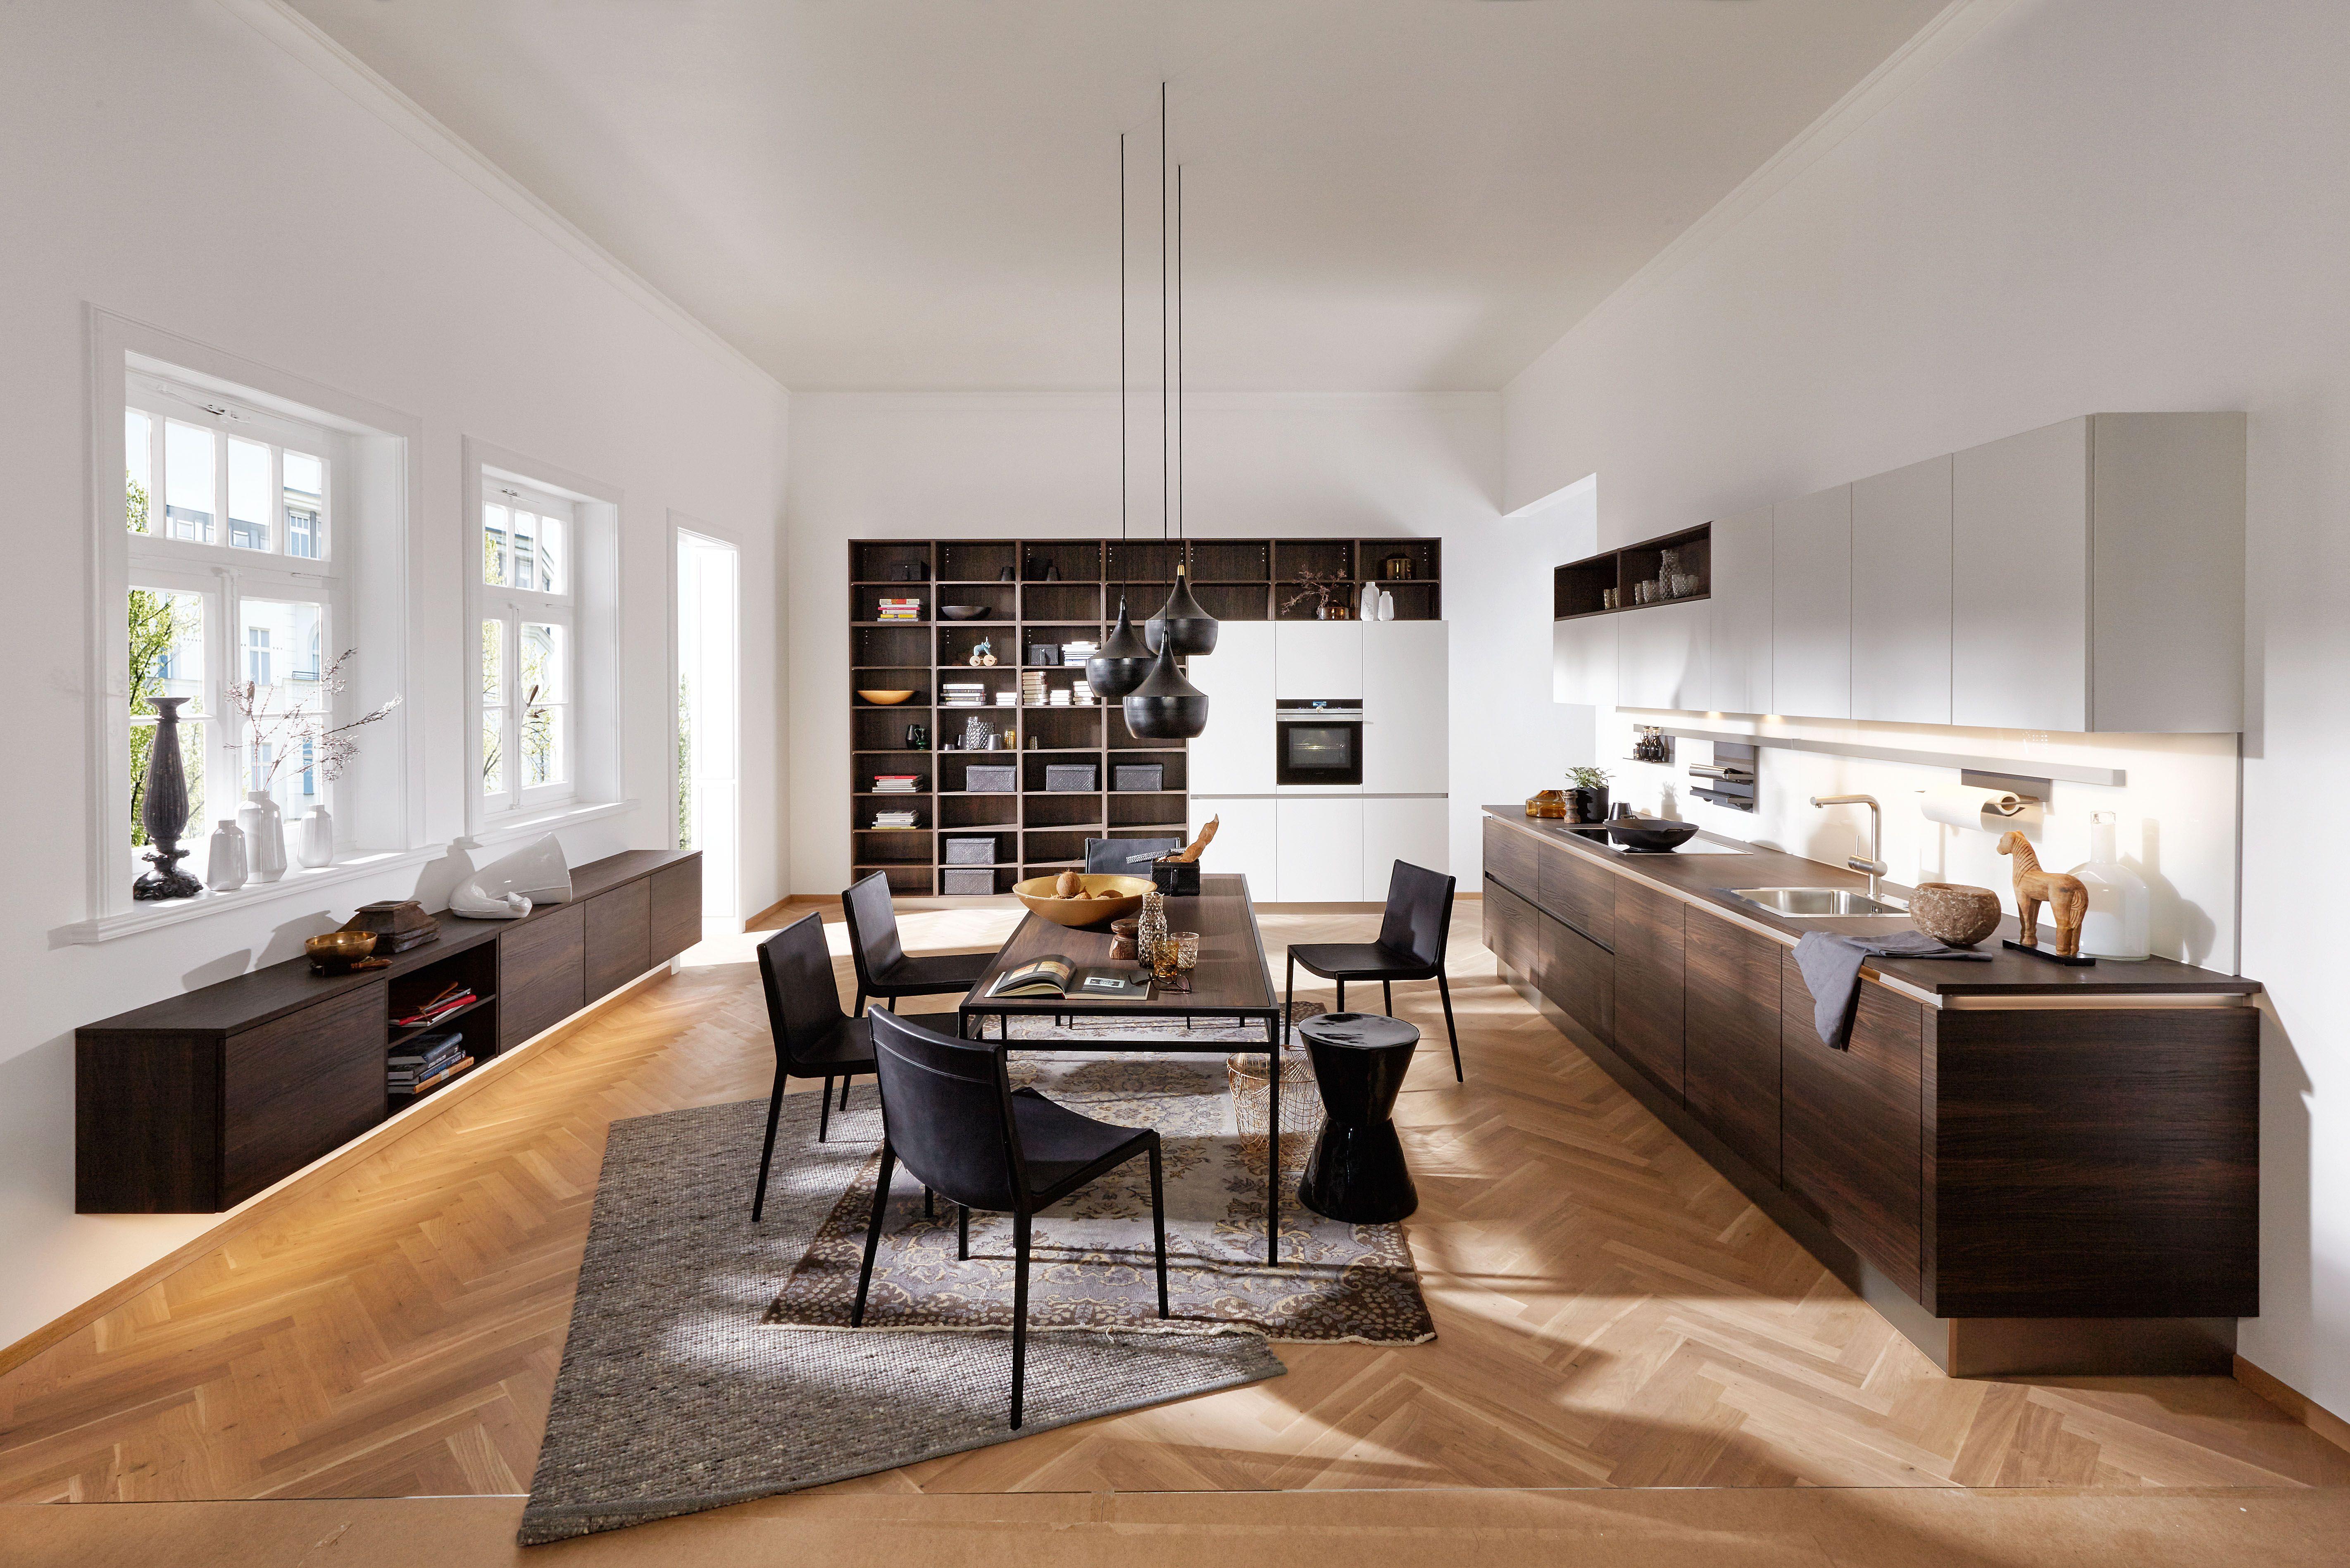 Home design bilder eine etage prachtige moderne keuken van nolte  onze eigen keukens  pinterest